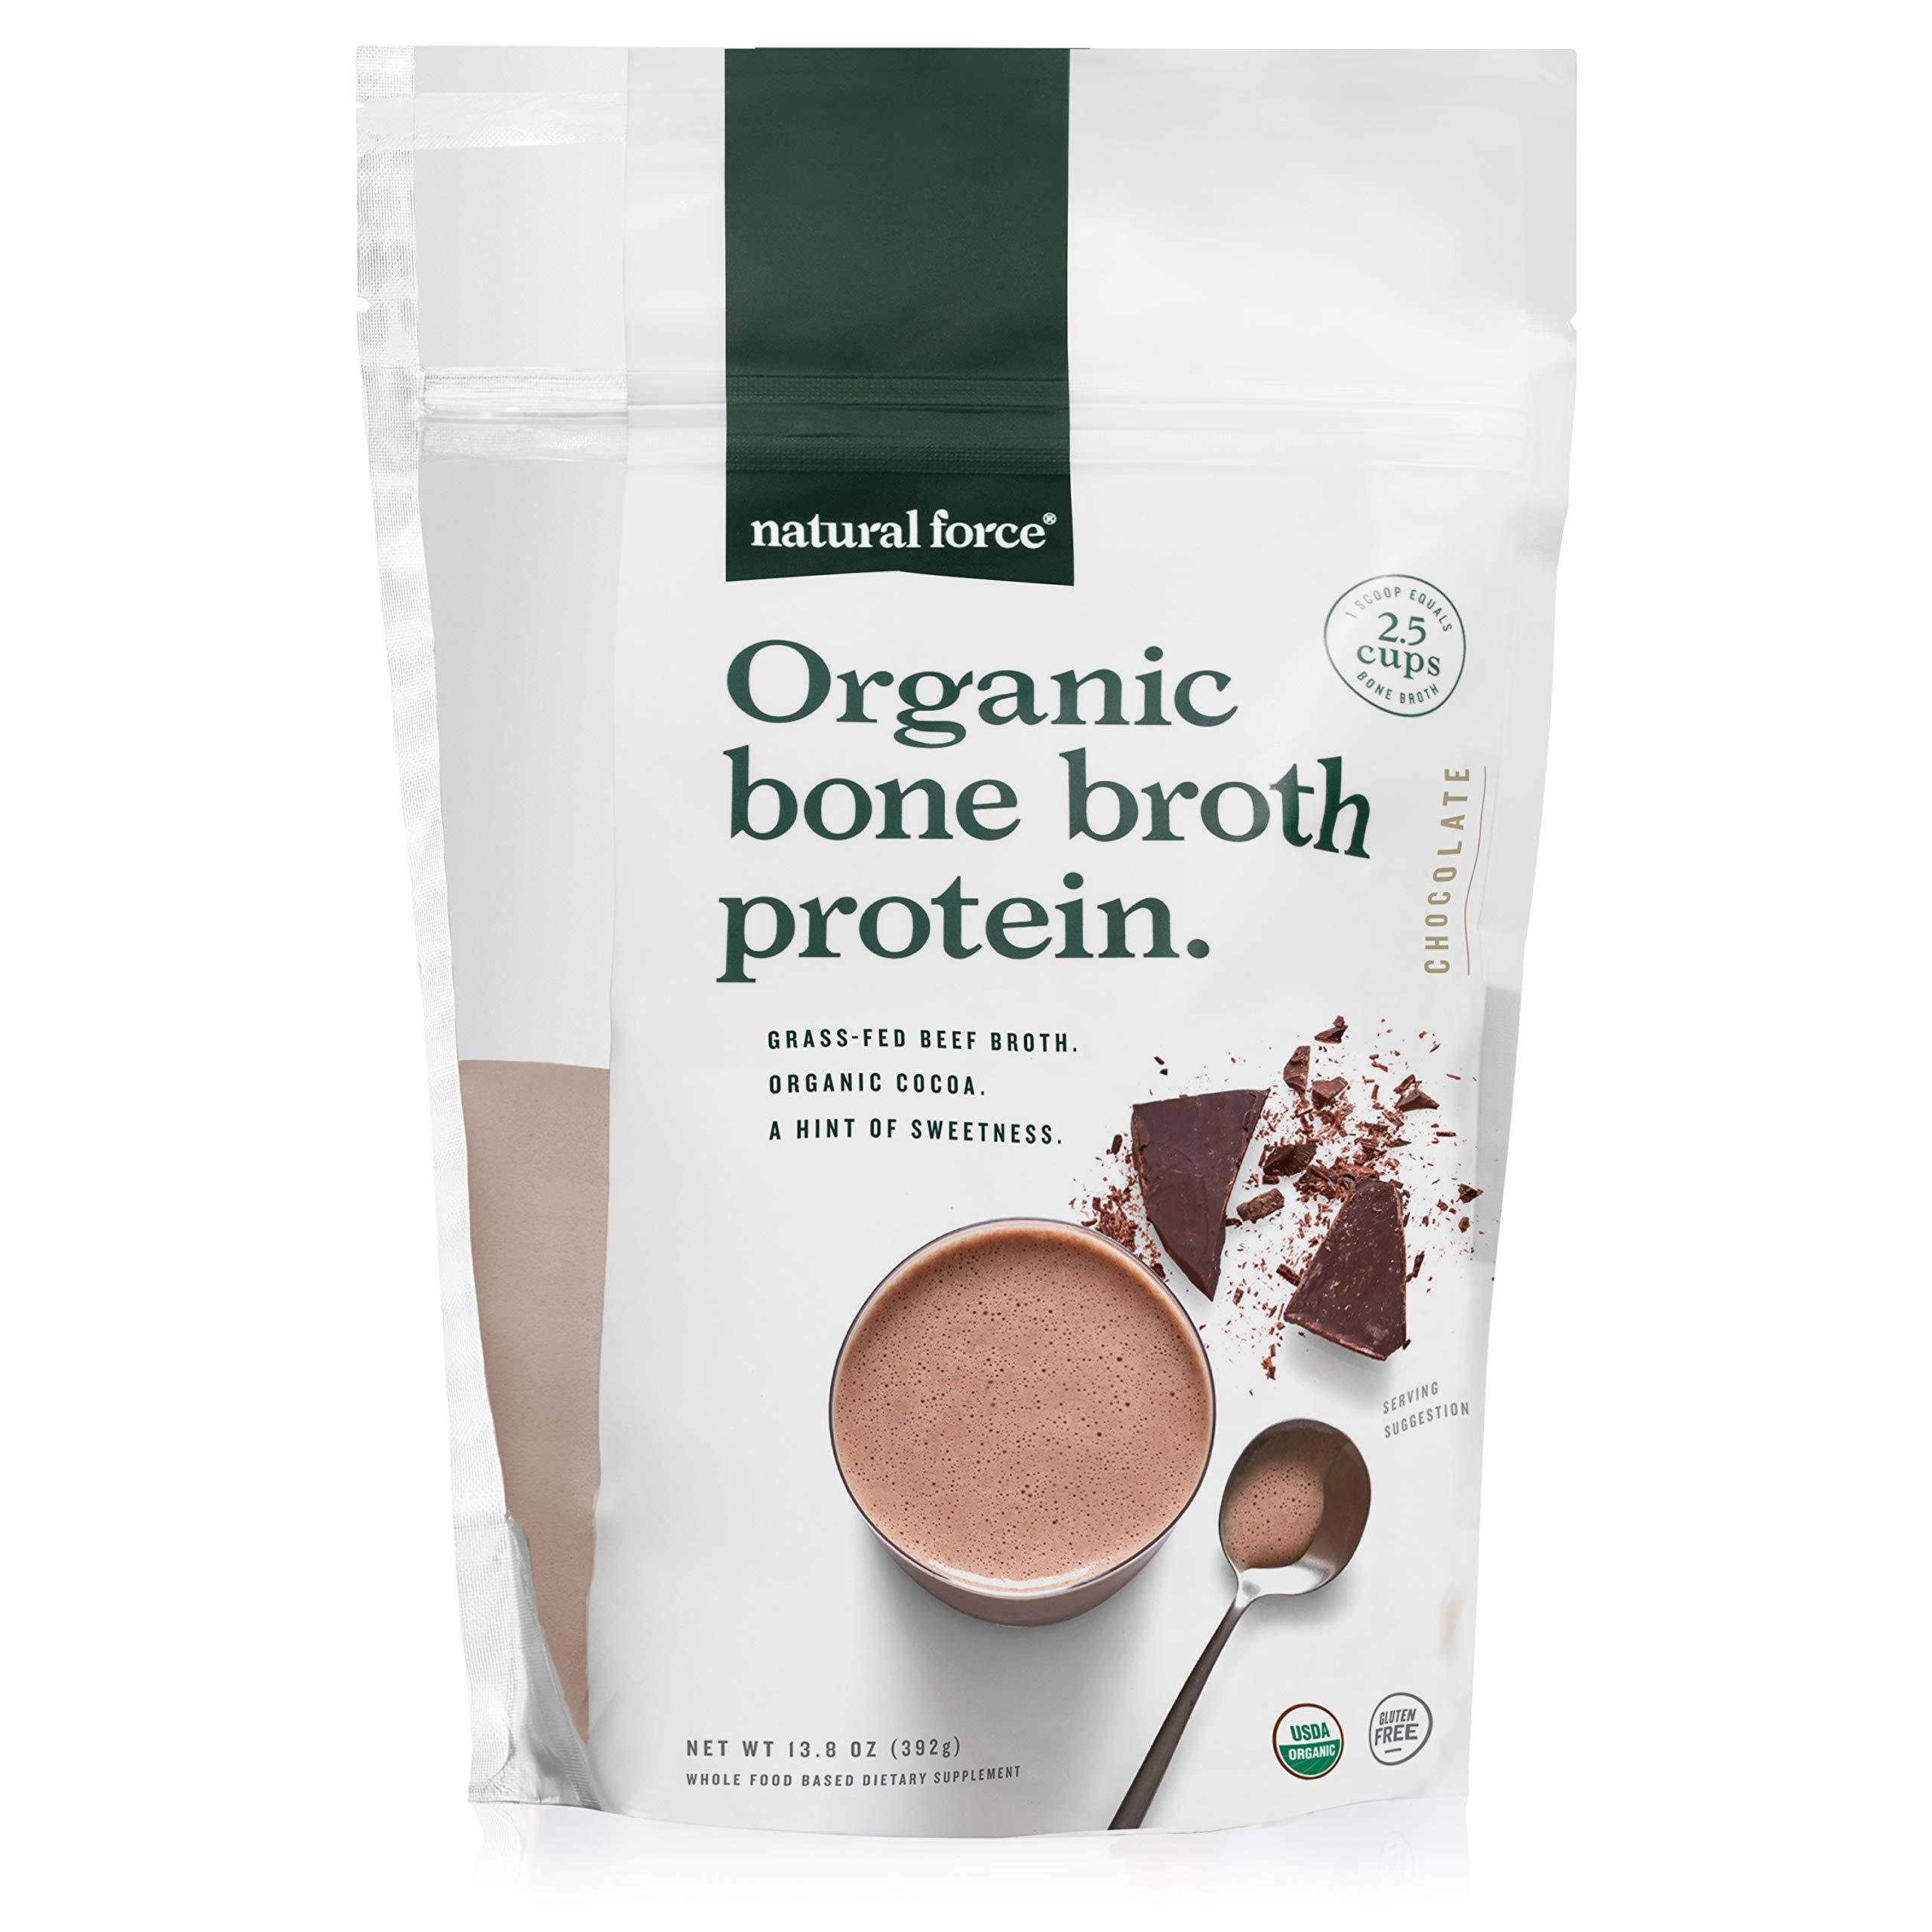 Natural Force Organic Bone Broth Protein Powder